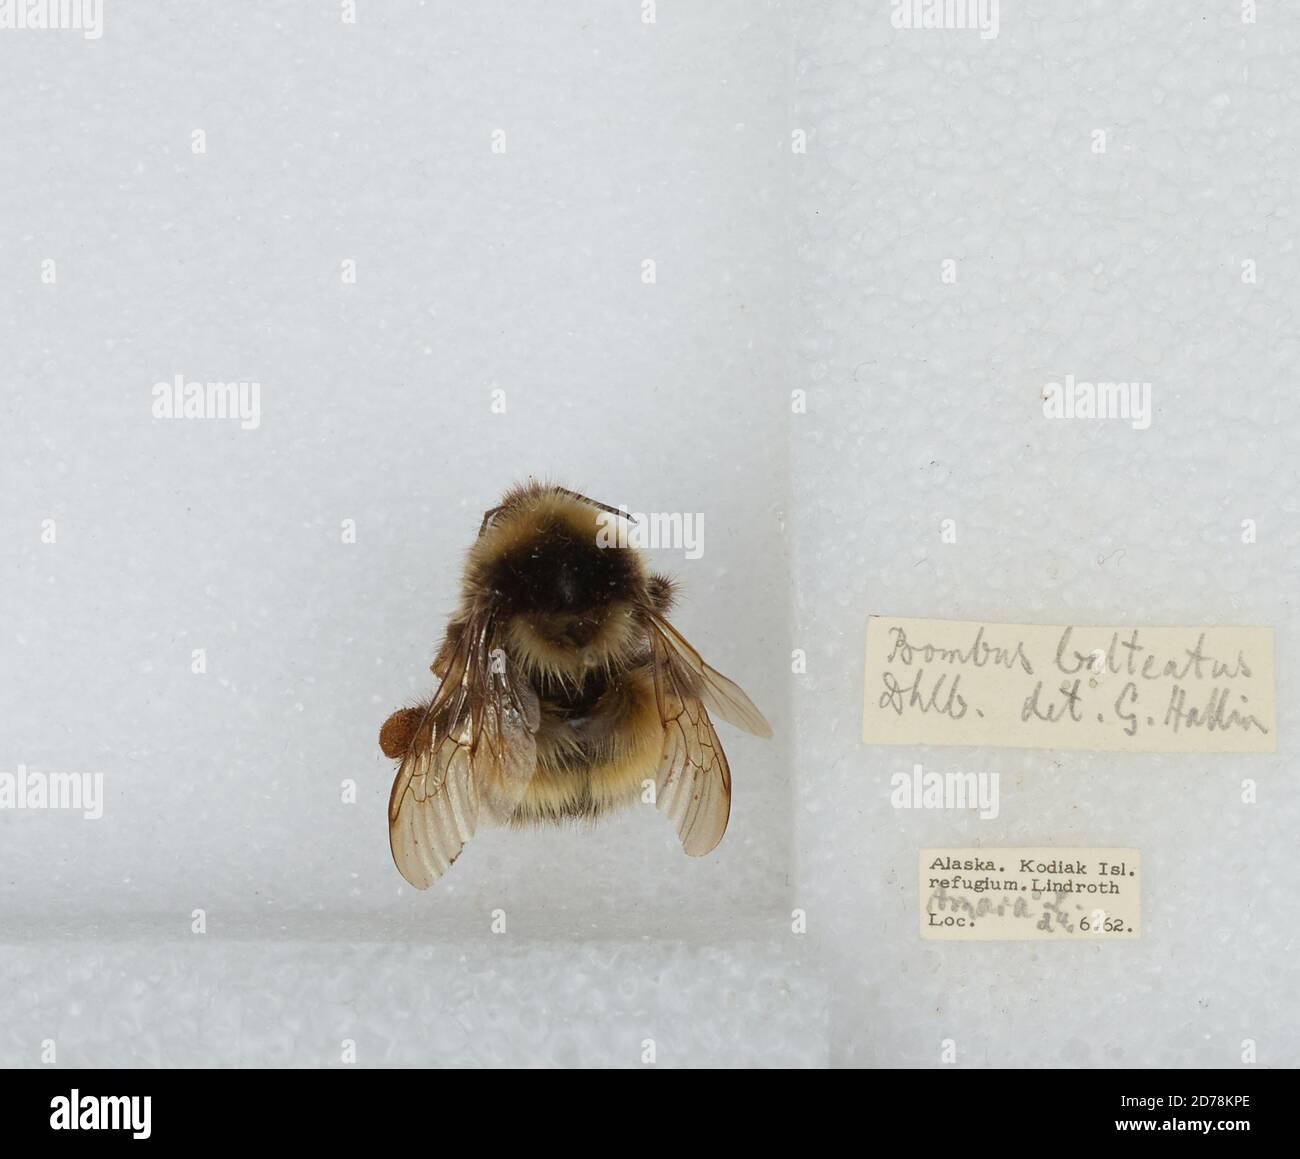 Kodiak Island Refugium, Kodiak Island, Alaska, États-Unis, Bombus sp., Animalia, Arthropoda, Insecta, Hyménoptères, Apidae, Apinae Banque D'Images